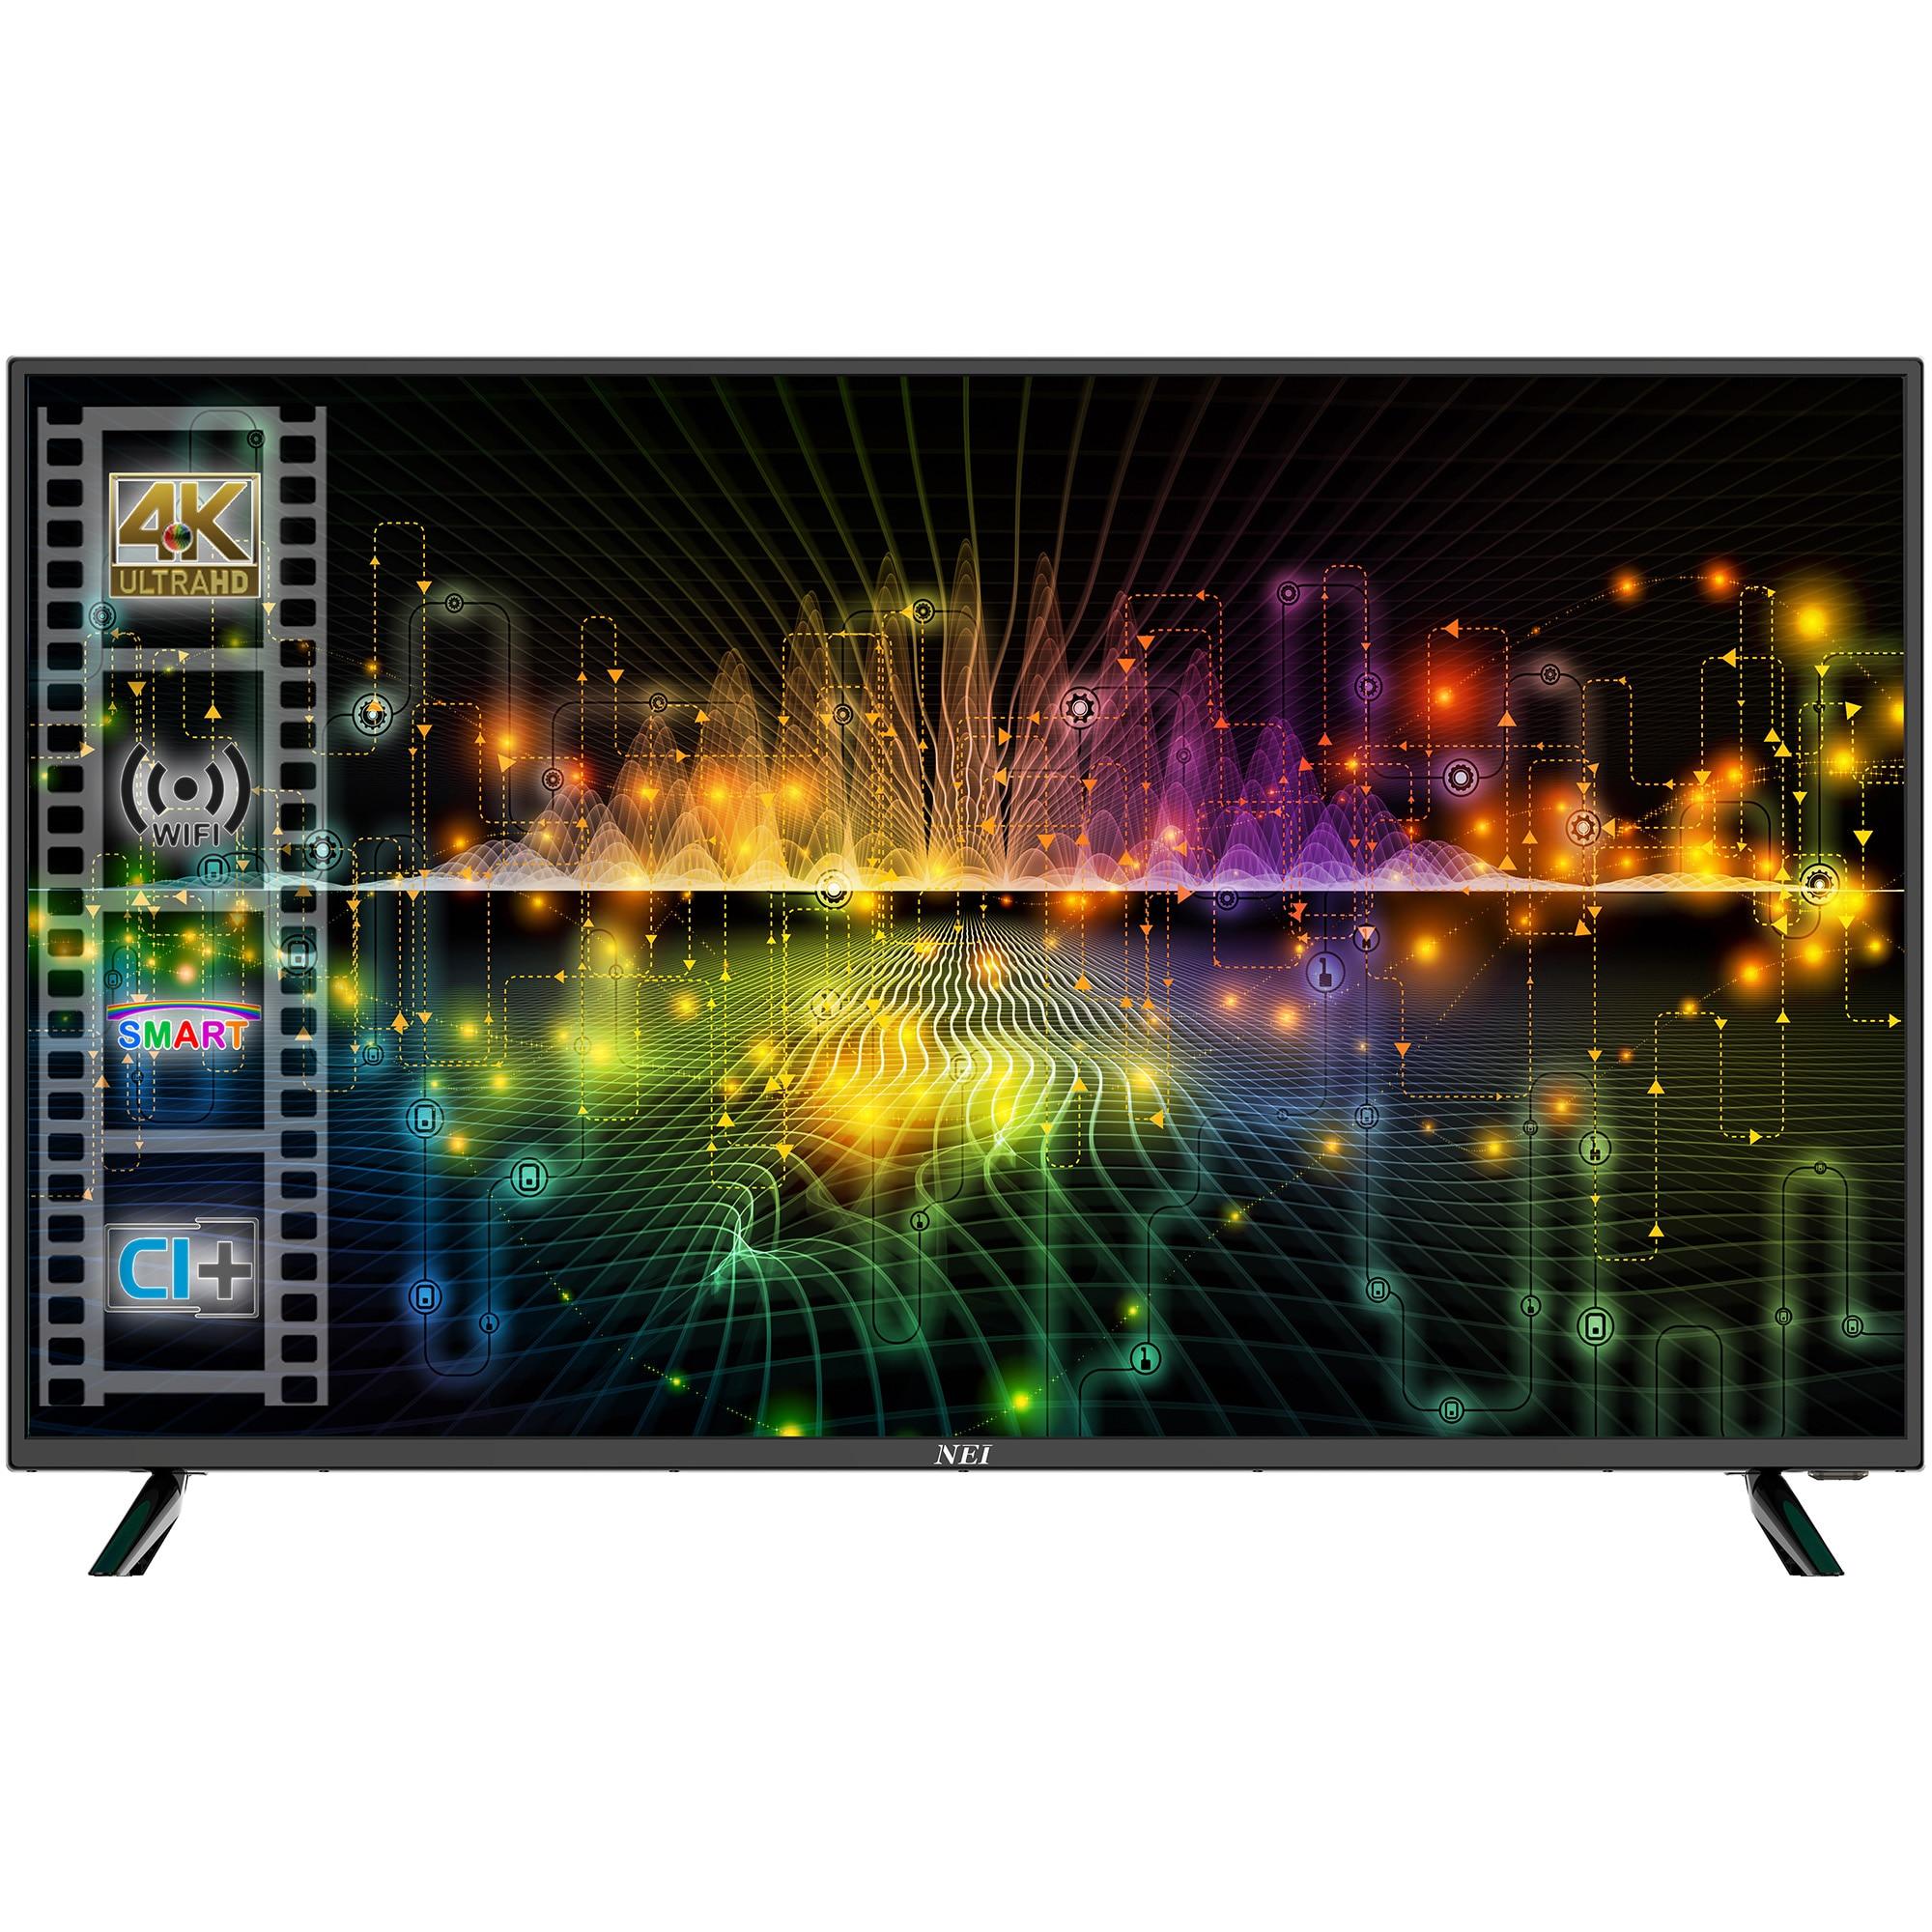 Fotografie Televizor Nei 40NE6700, 100 cm, Smart, 4K Ultra HD, LED, Clasa A